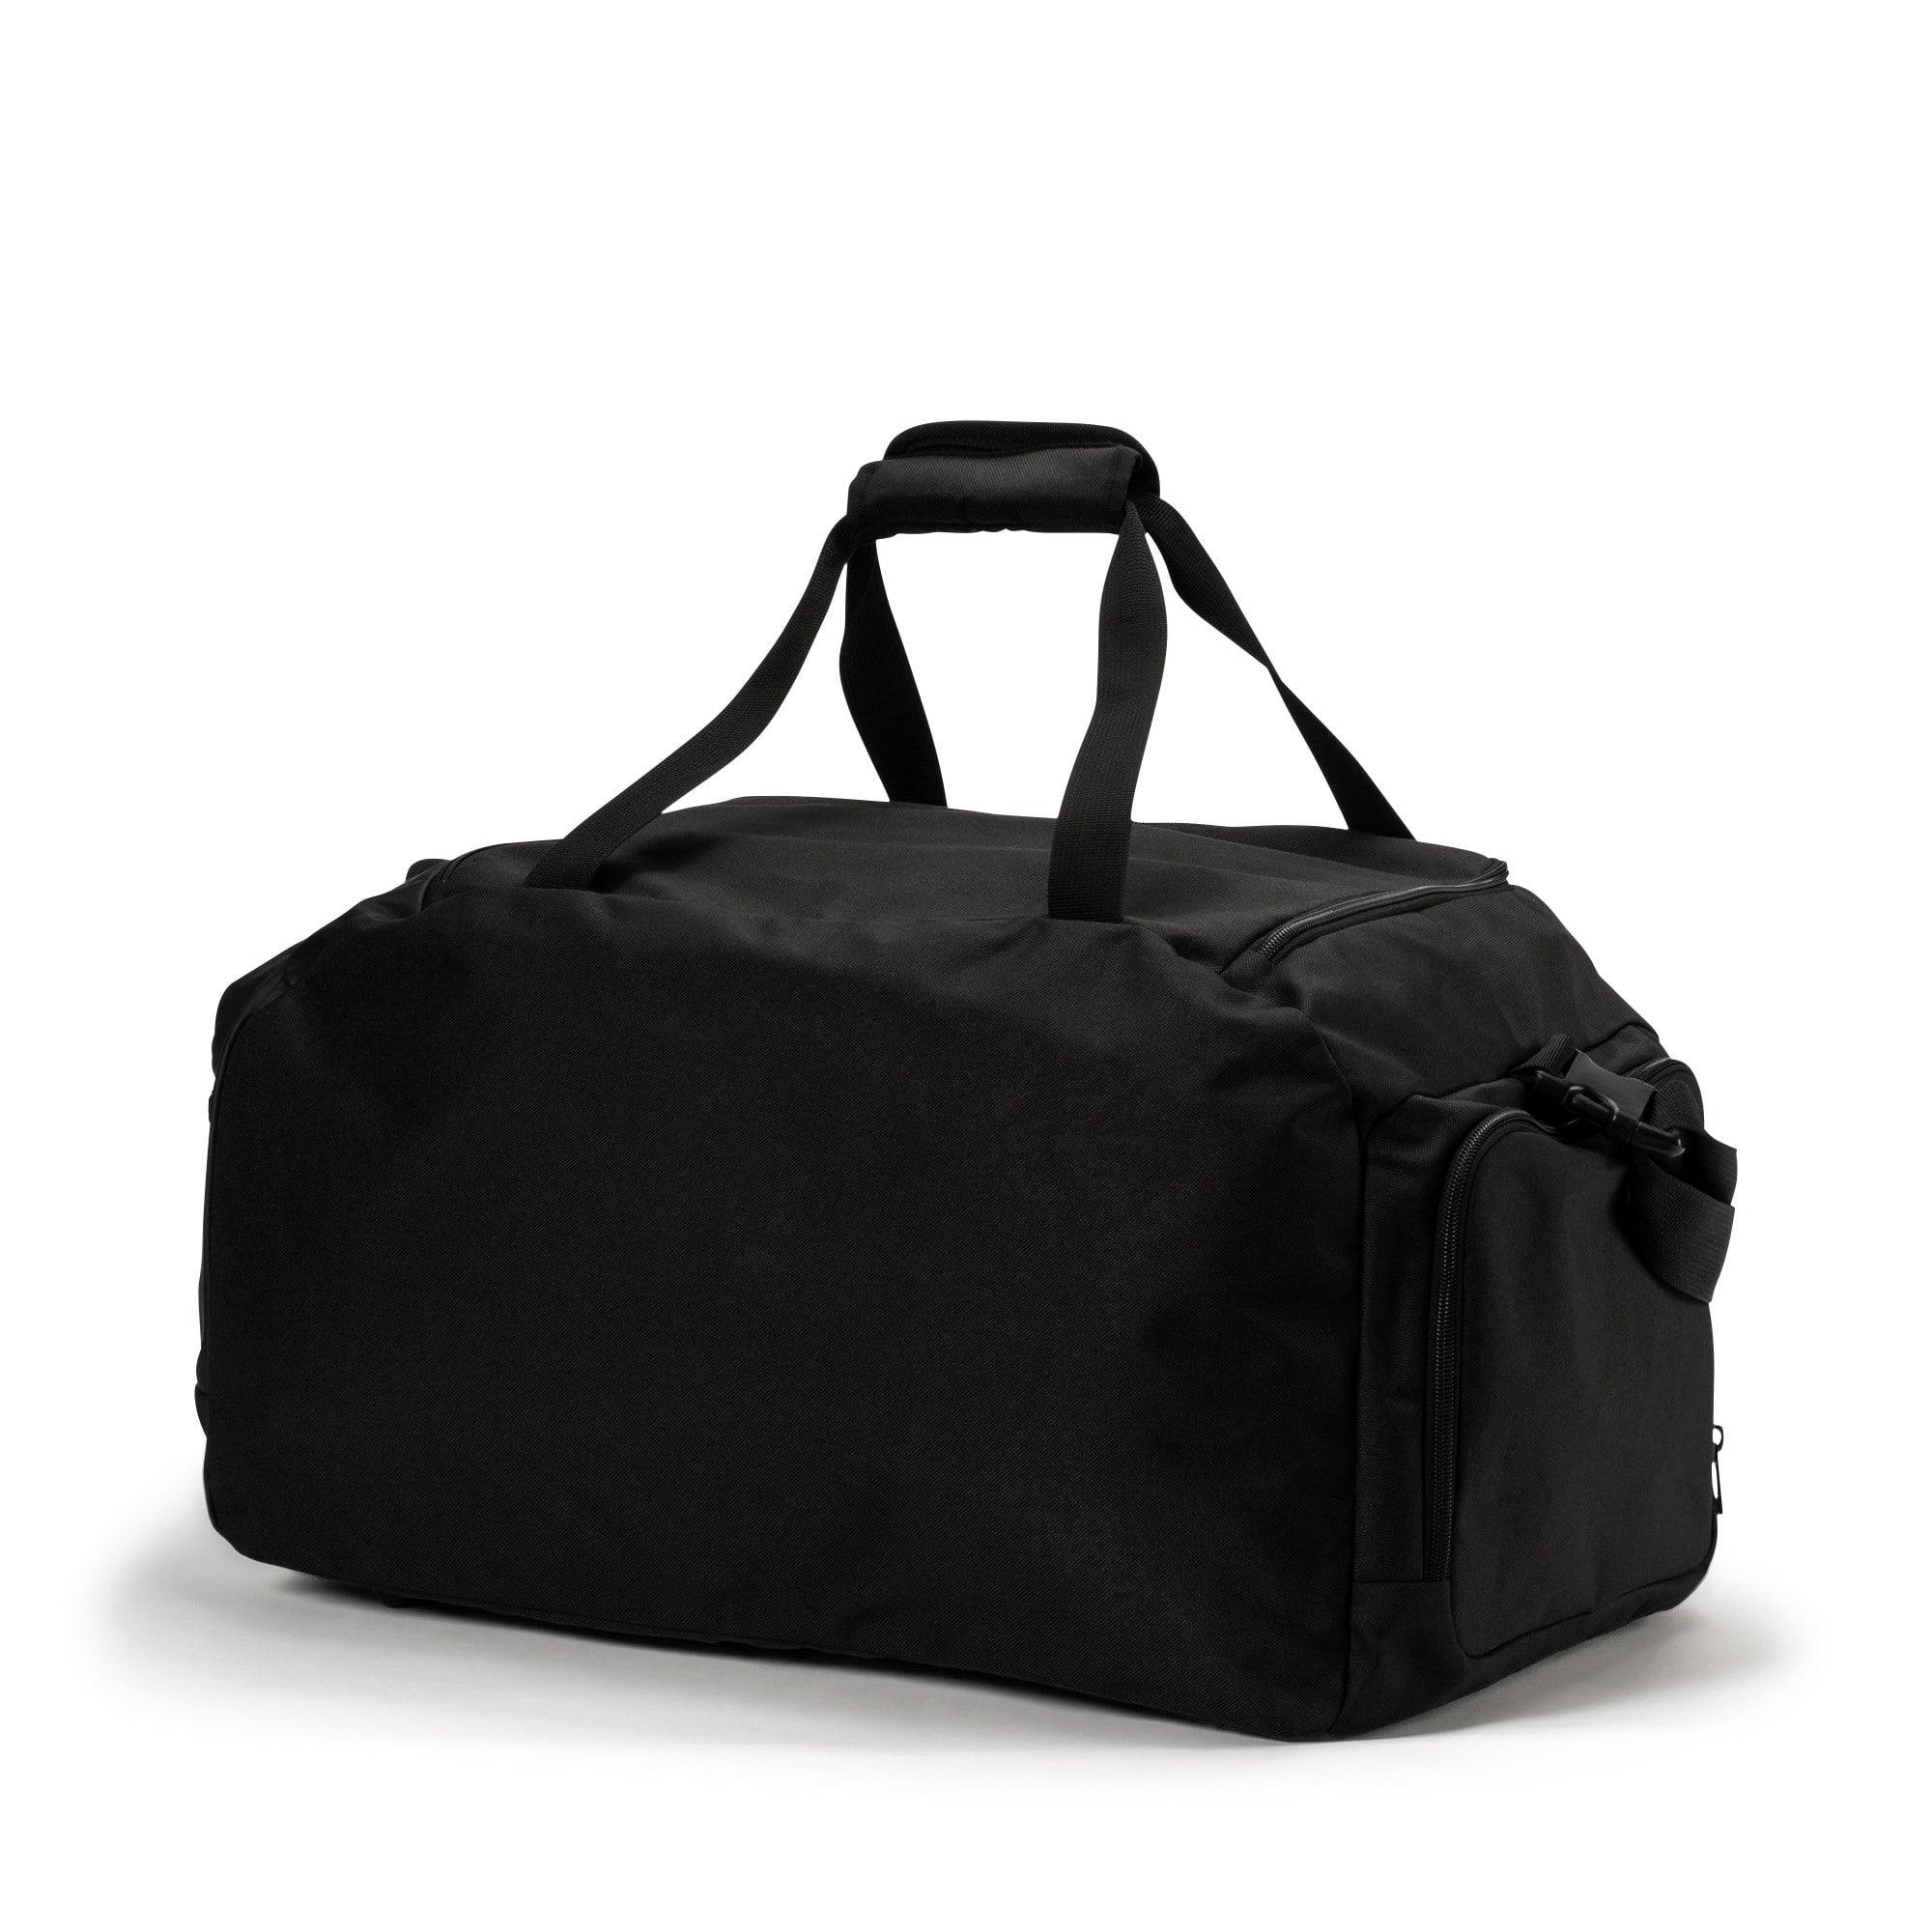 Thumbnail 2 of Olympique de Marseille LIGA Medium Bag, AZURE BLUE-Puma Black, medium